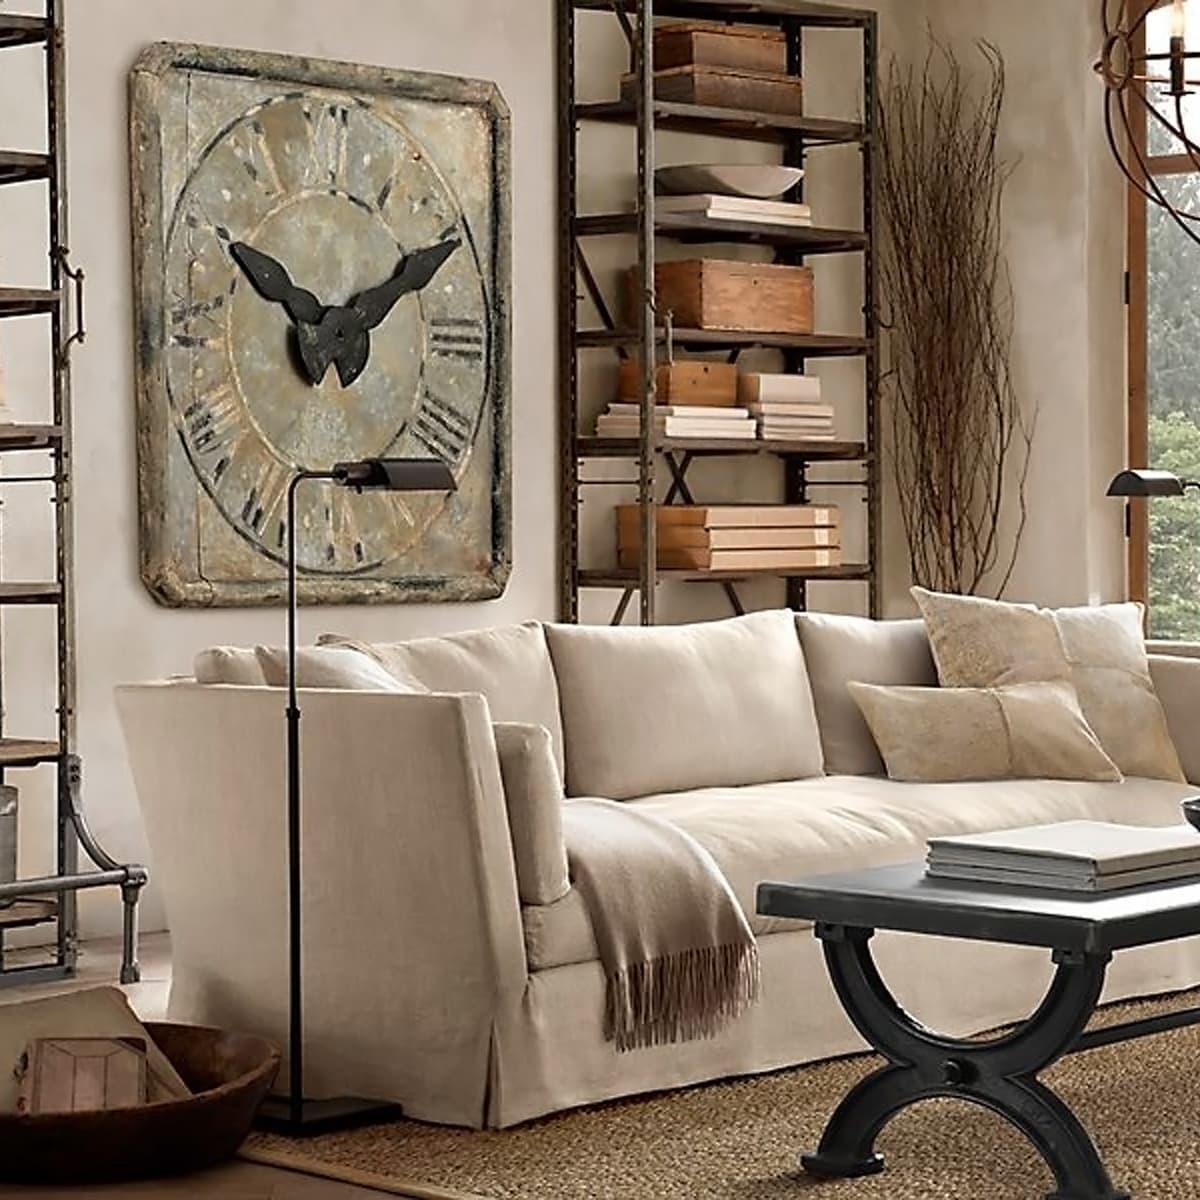 Restoration Hardware Grand Saint Etienne stone wall clock